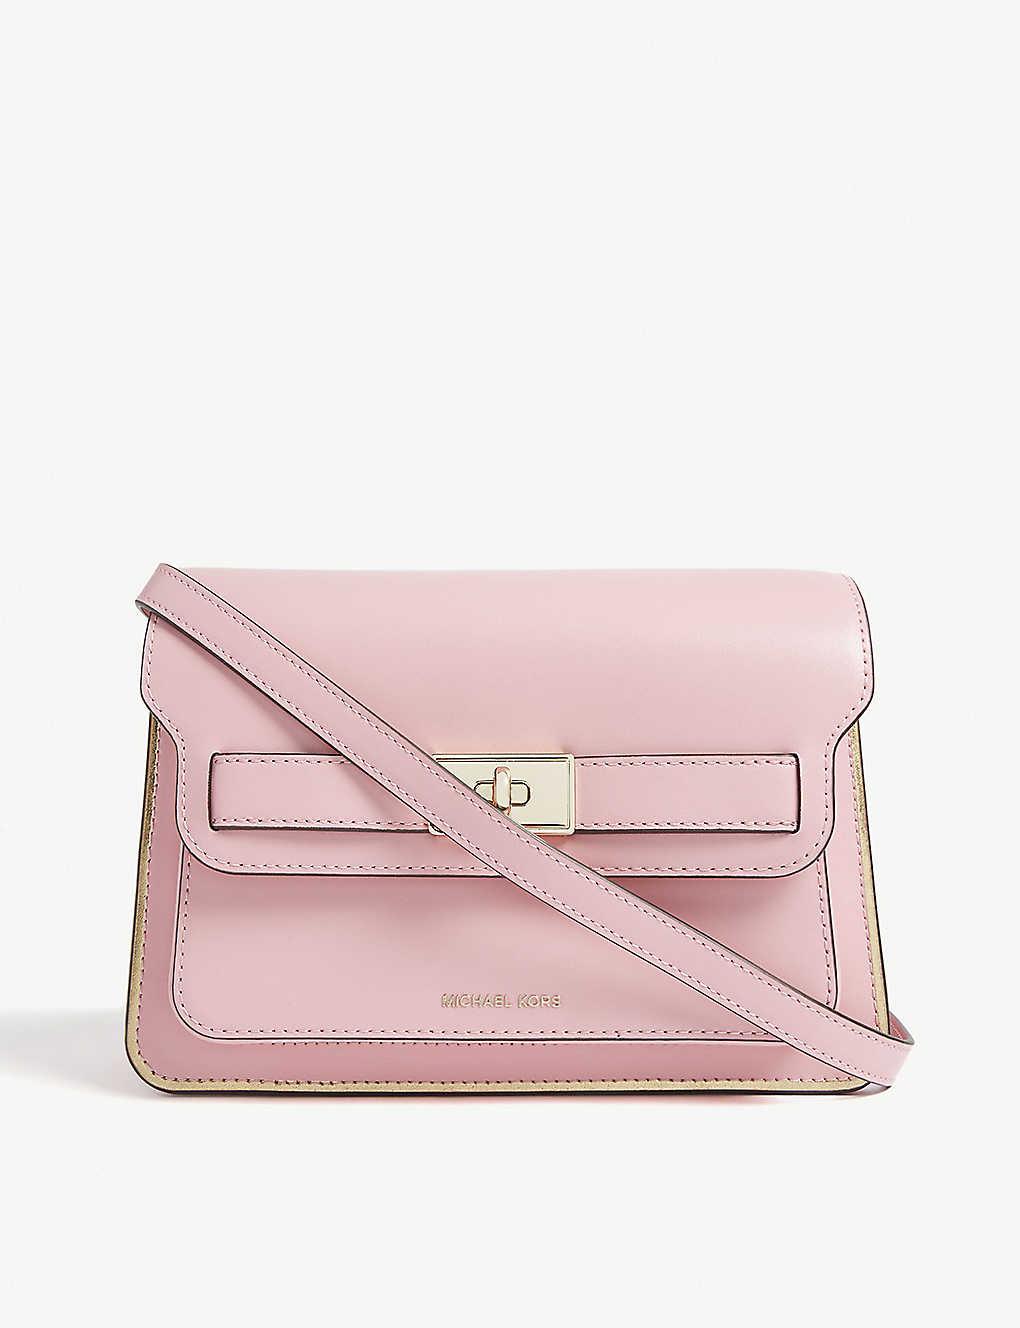 a7f38bf0a395 MICHAEL MICHAEL KORS - Tatiana mini leather shoulder bag ...